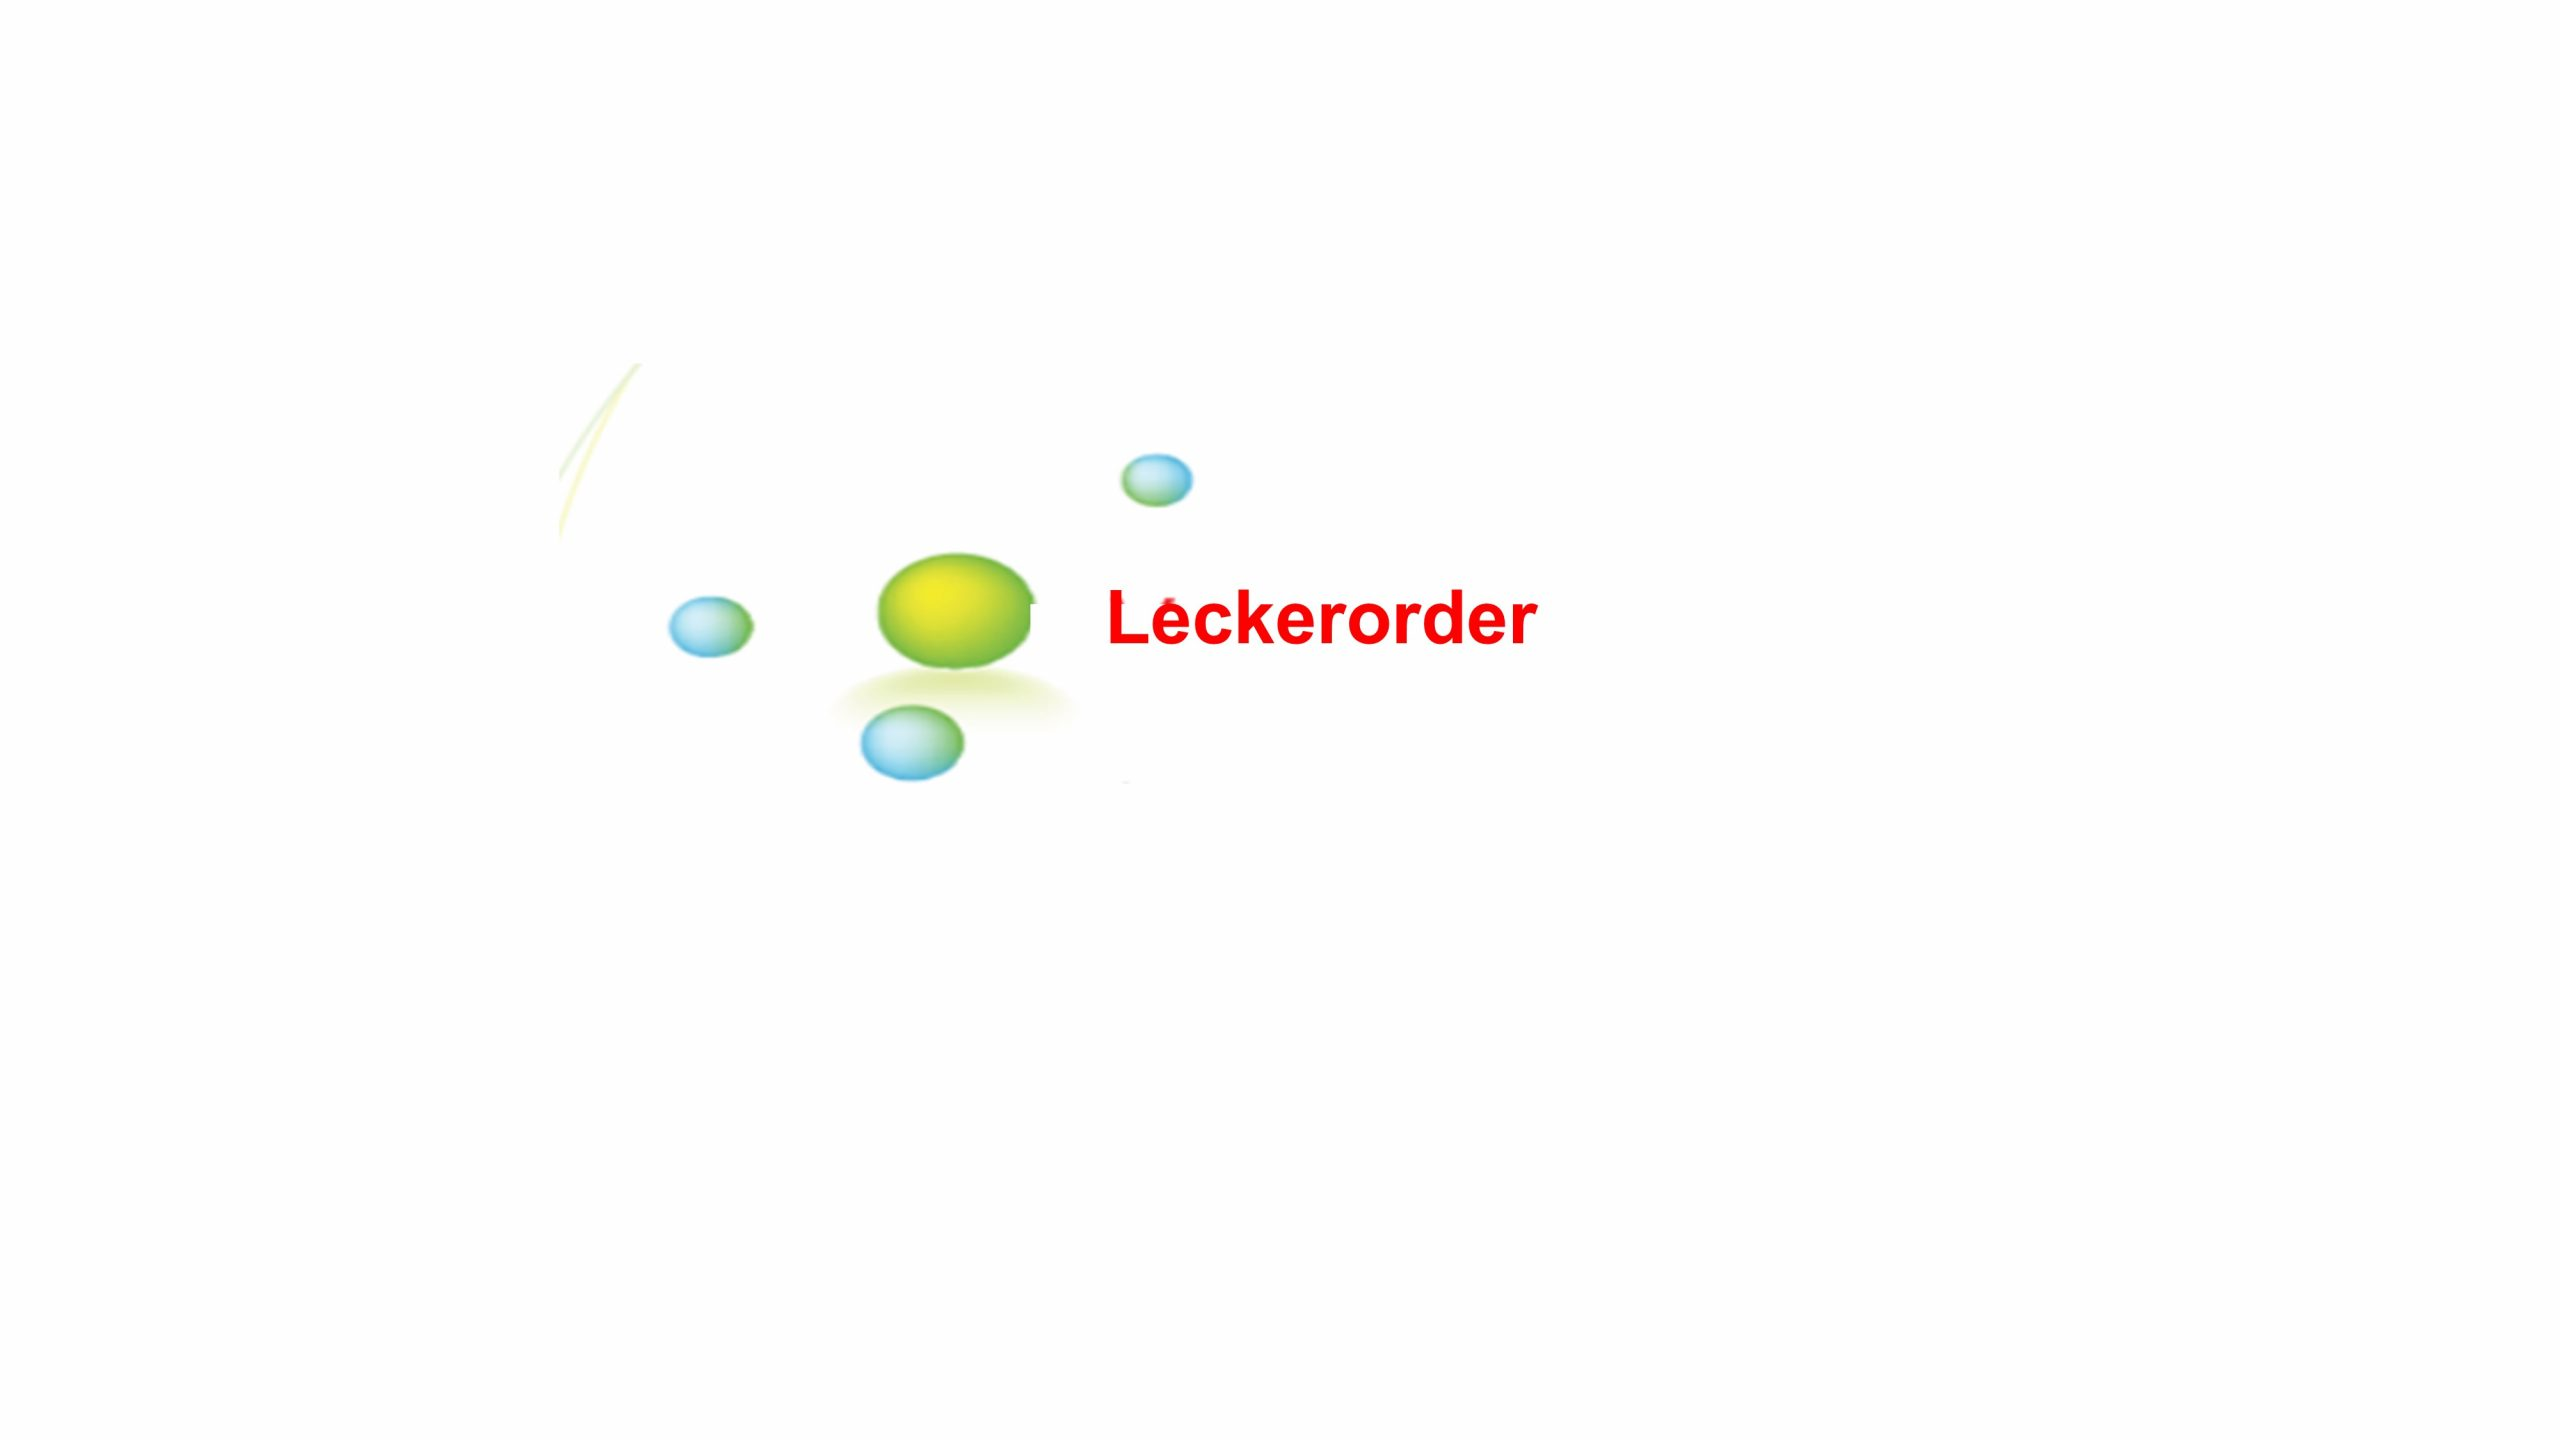 Leckerorder